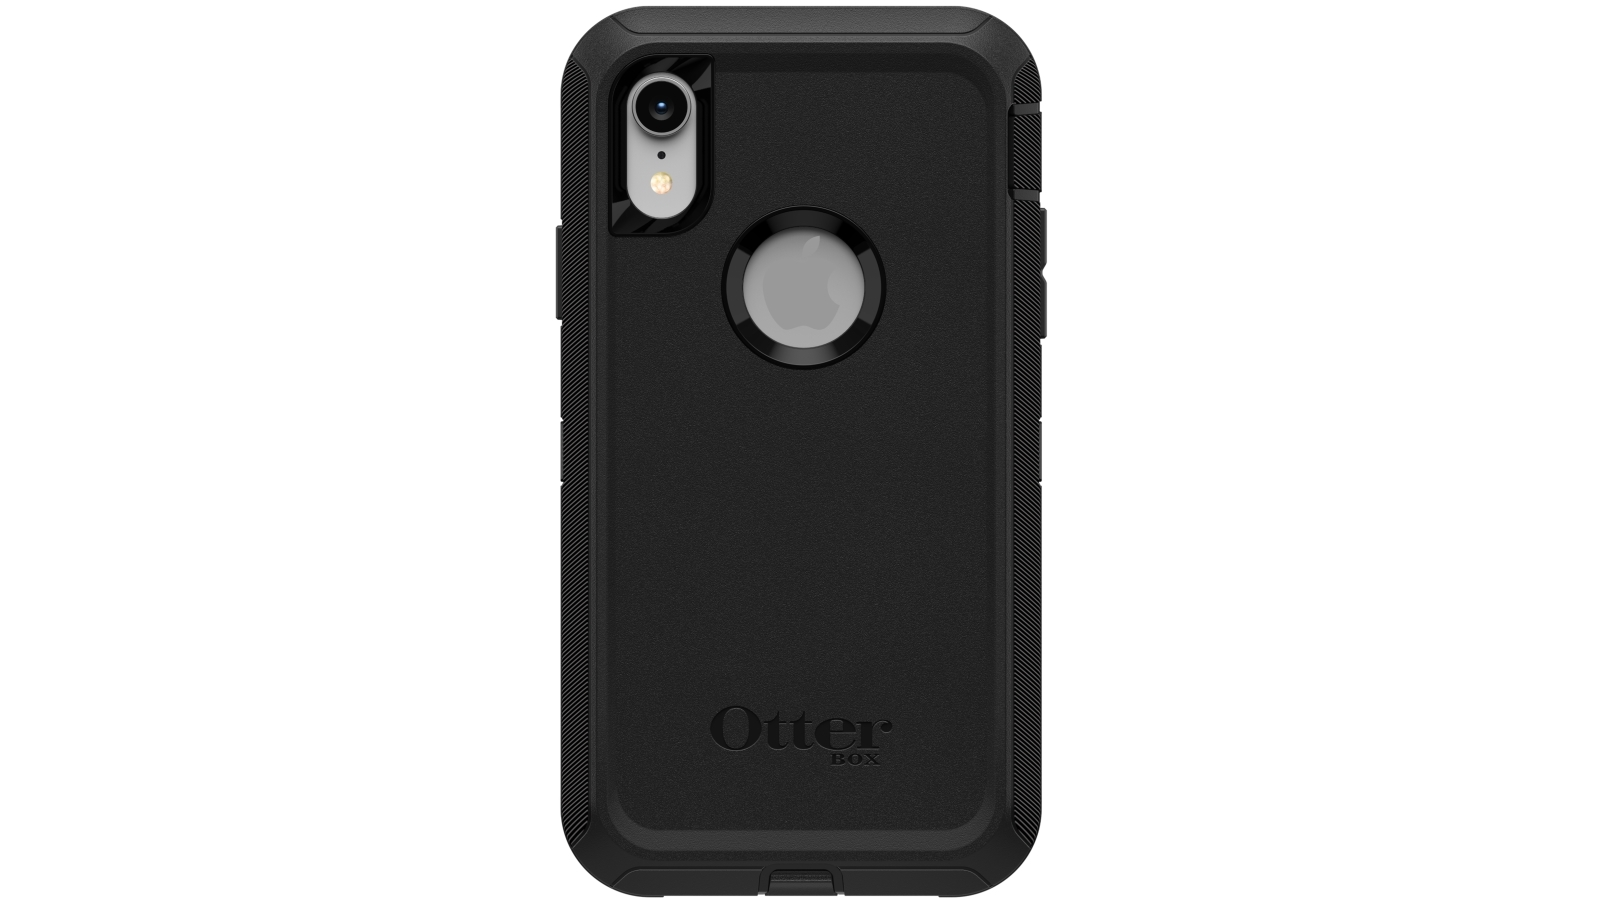 separation shoes 73004 d0bee OtterBox Defender Case iPhone XR - Black